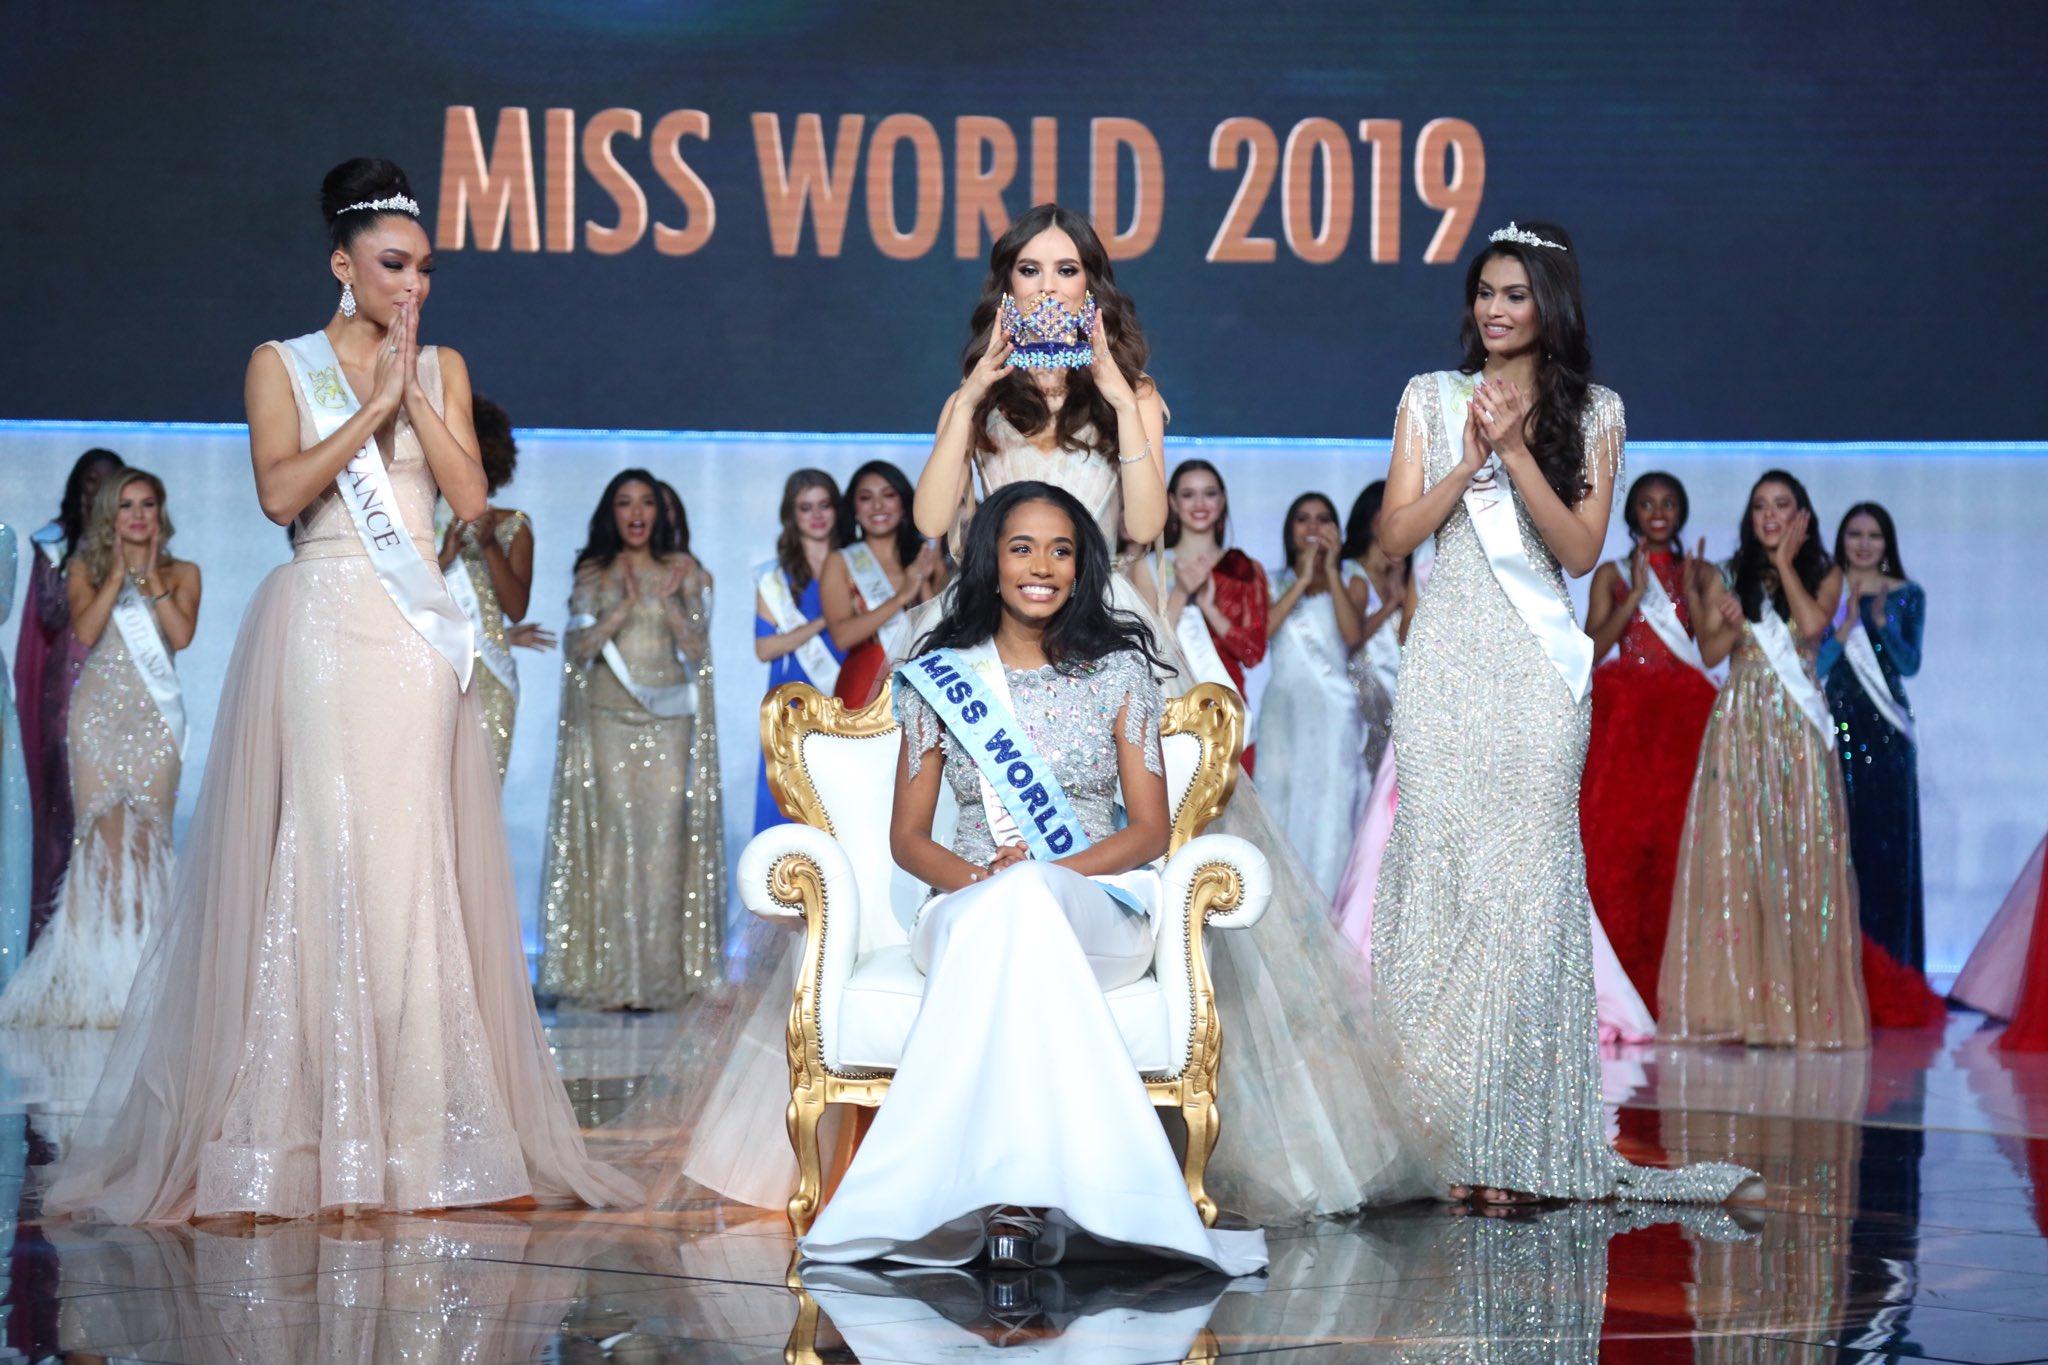 toni-ann singh, miss world 2019. - Página 3 Elxehp10